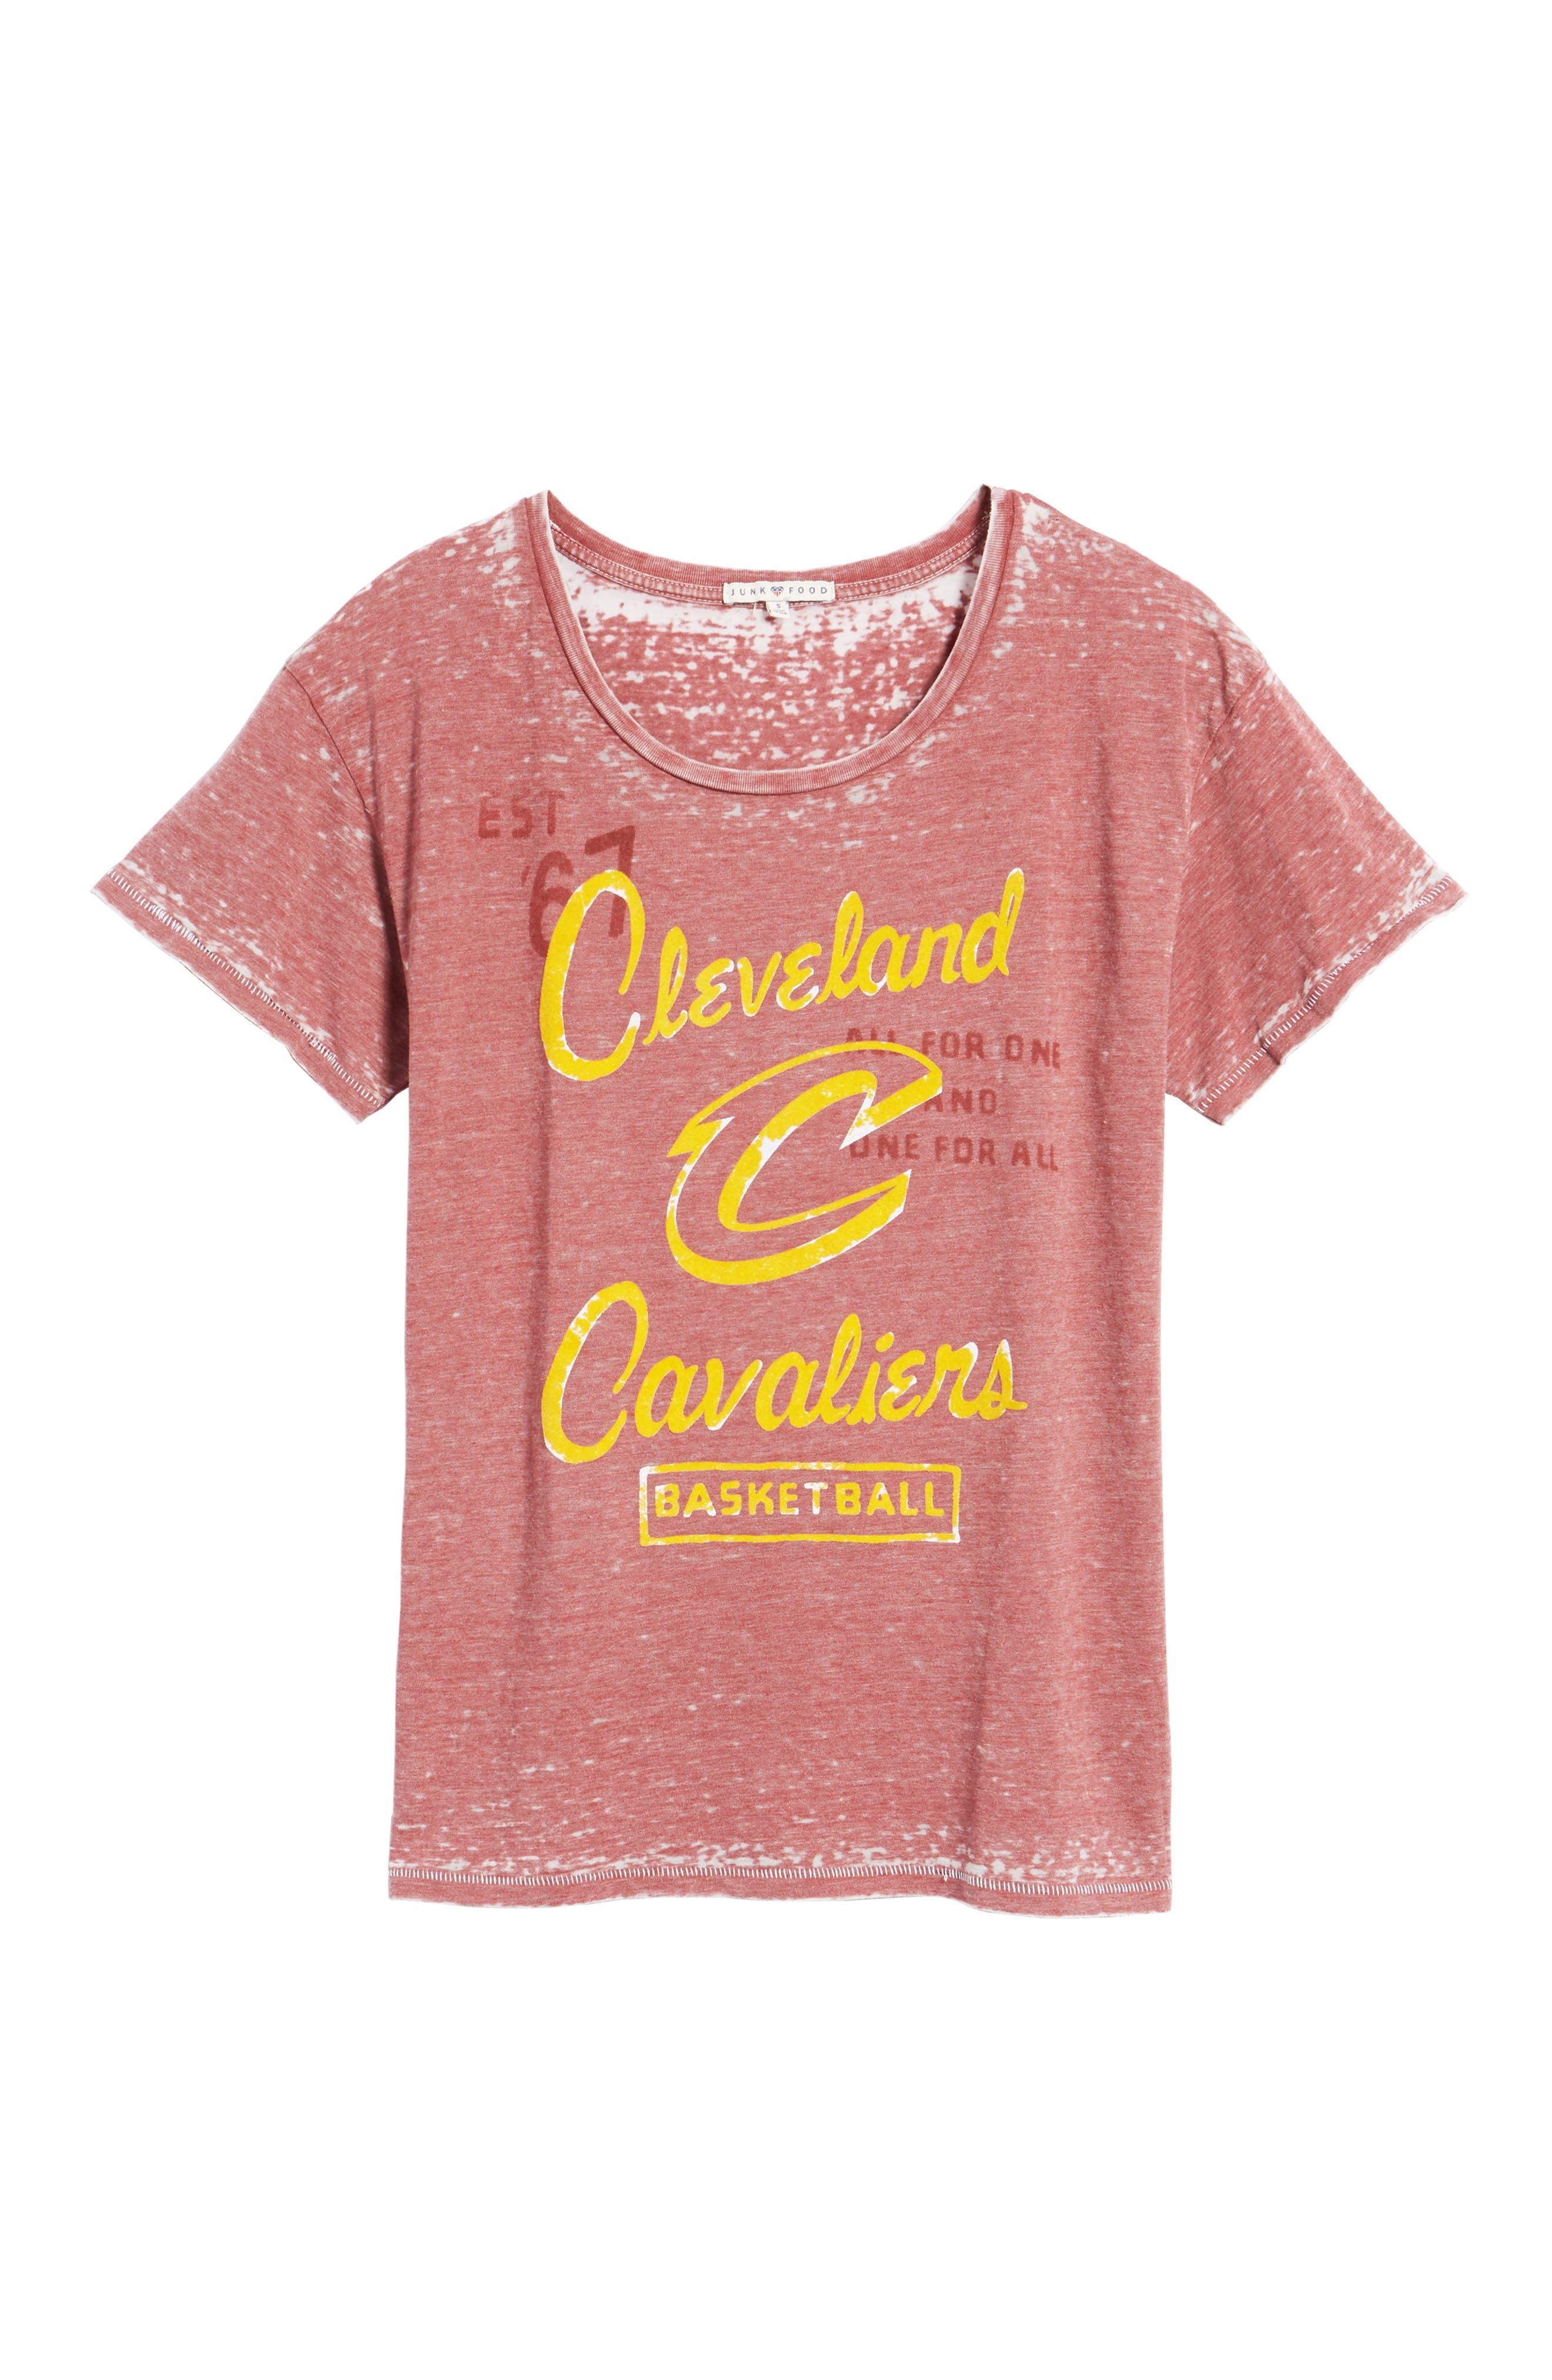 NBA Cleveland Cavaliers Tee,                             Alternate thumbnail 6, color,                             Crimson